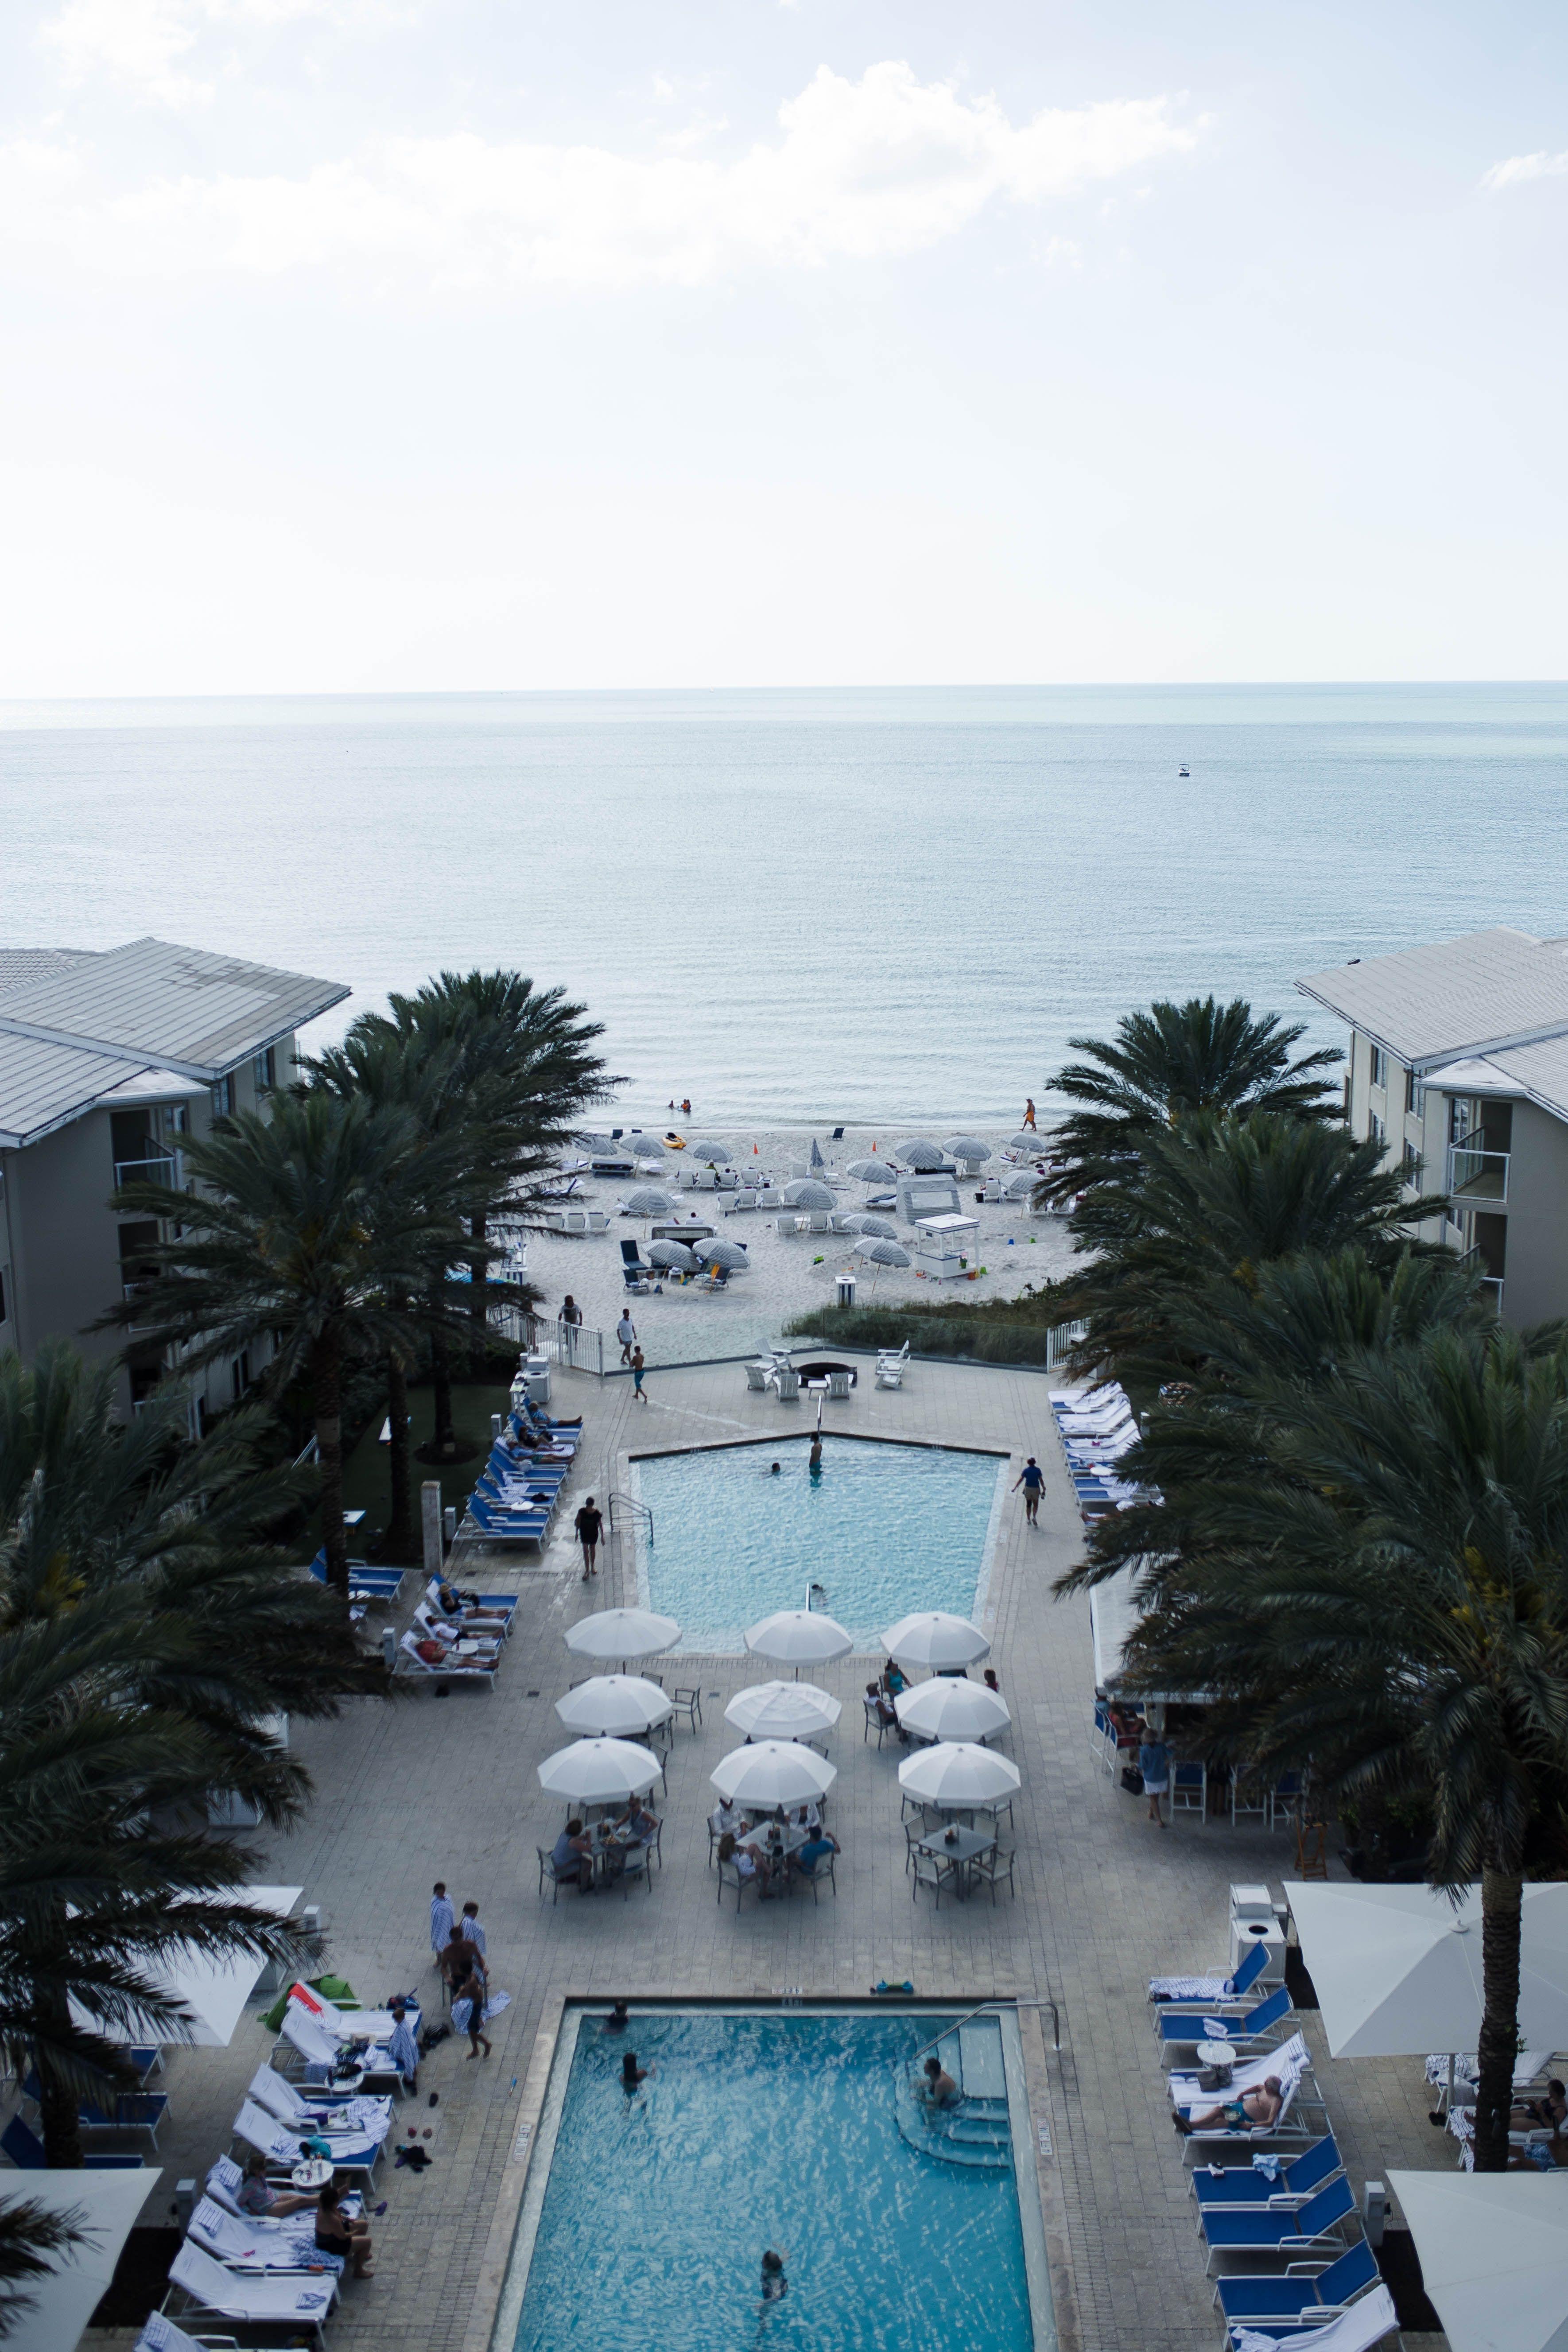 Travel Guide Naples Florida Edgewater Beach Beach Hotels Naples